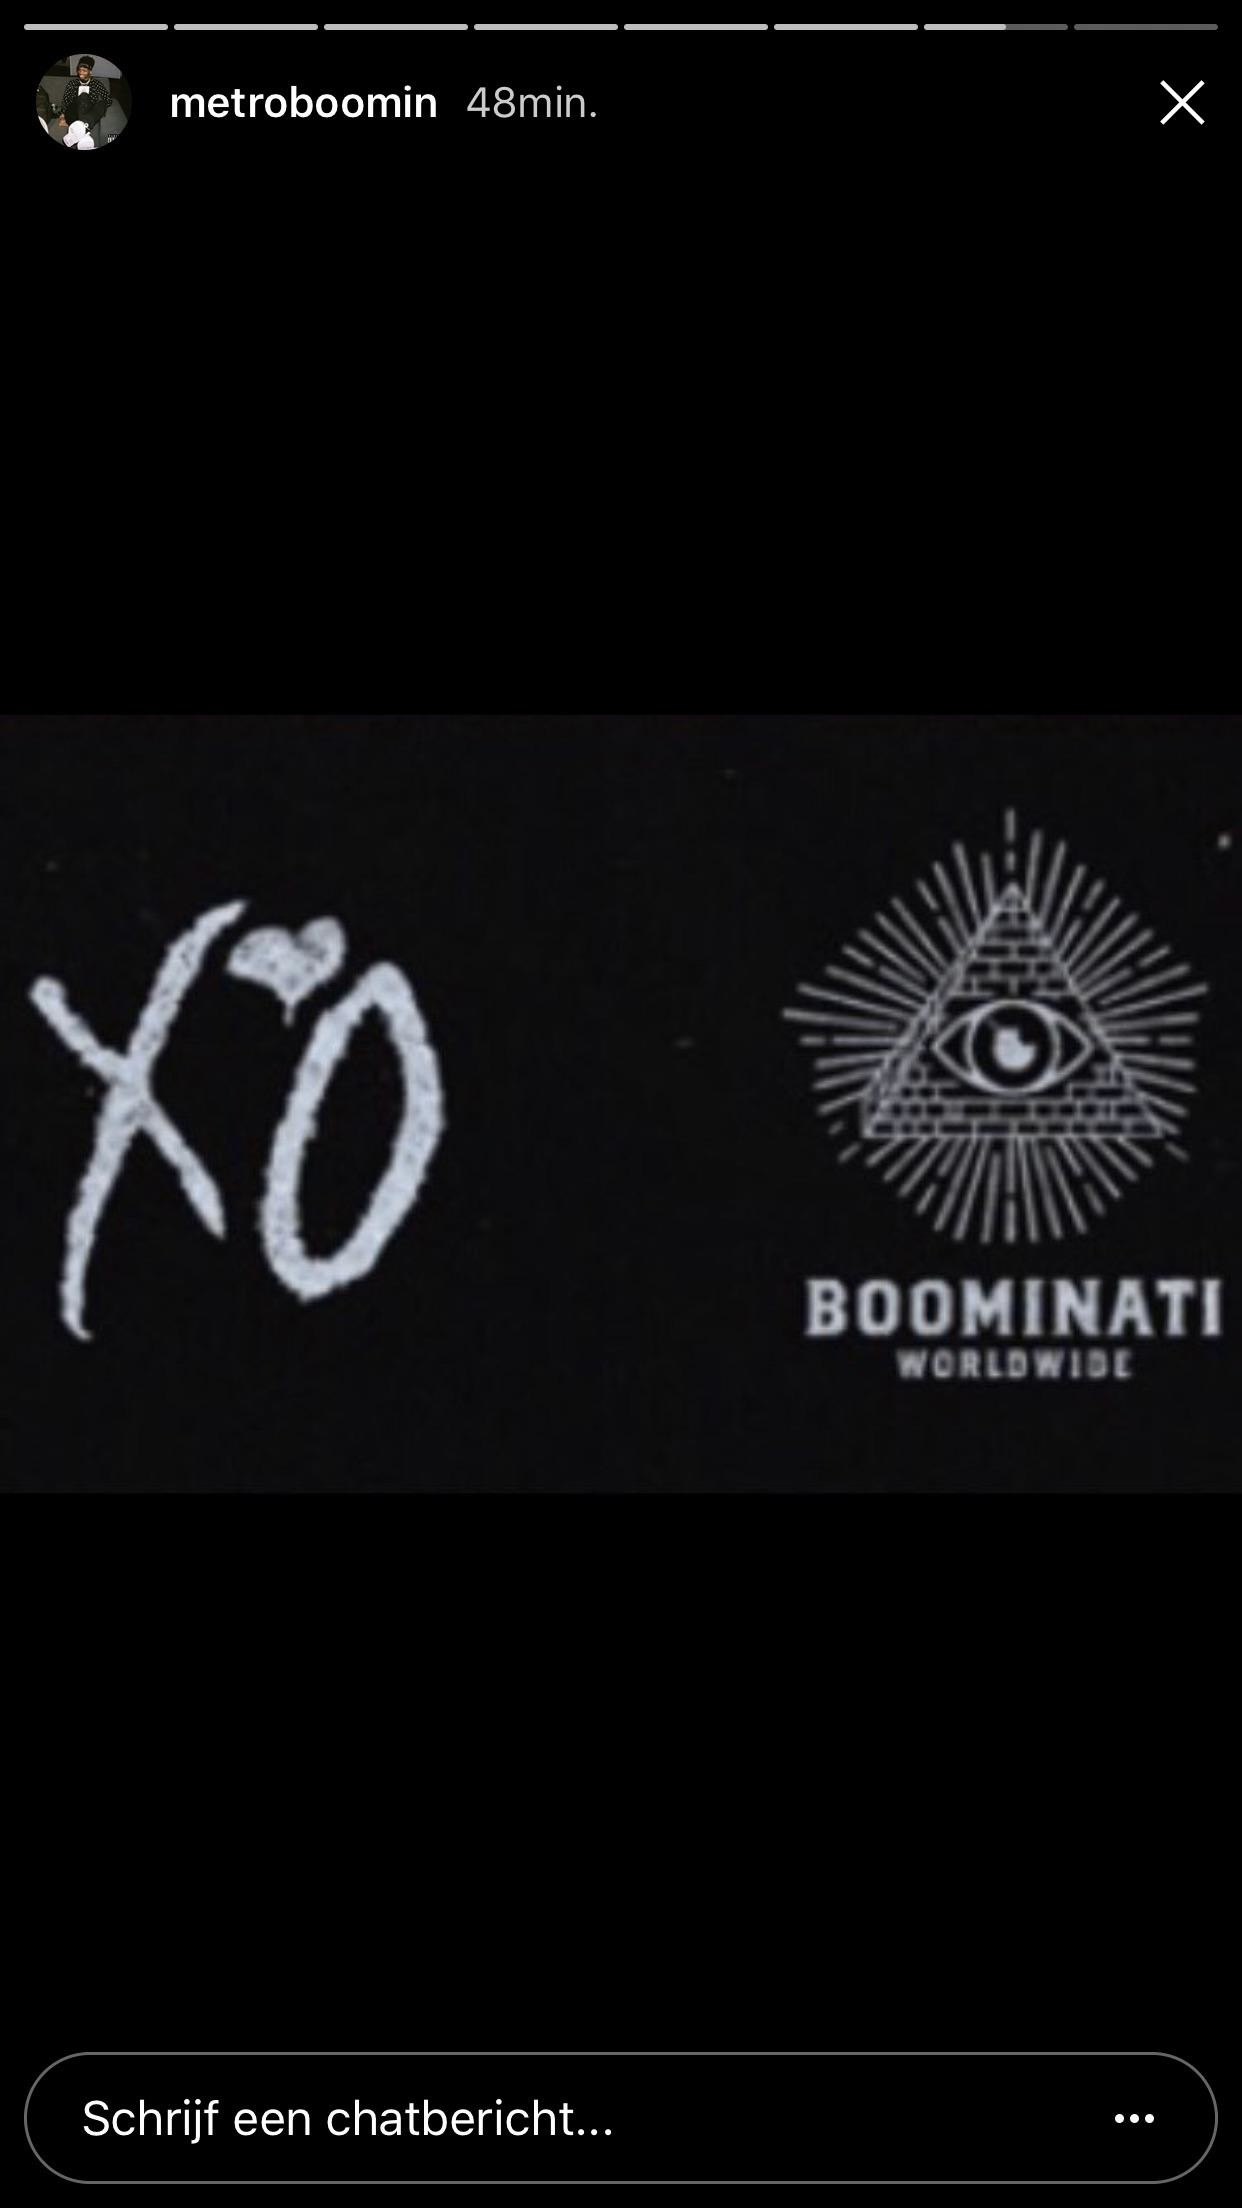 Xo Til We Overdose Wallpaper (66+ images)